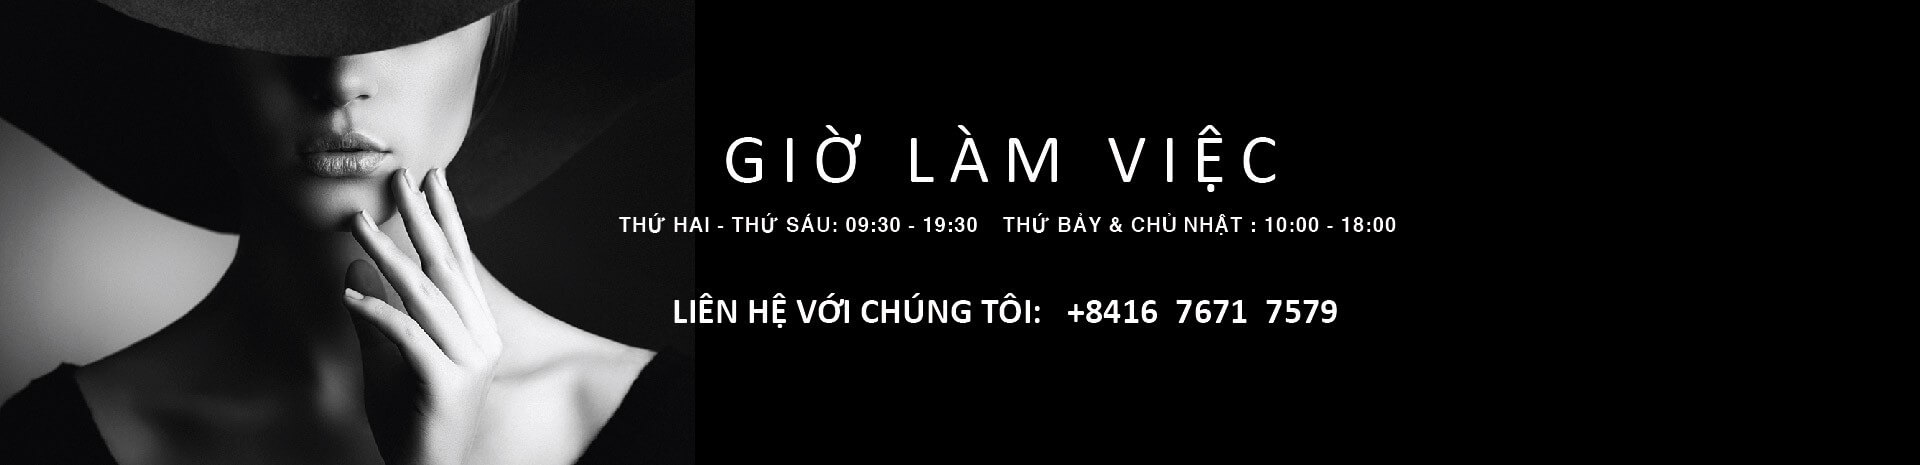 SIAN Gio Lam Viec